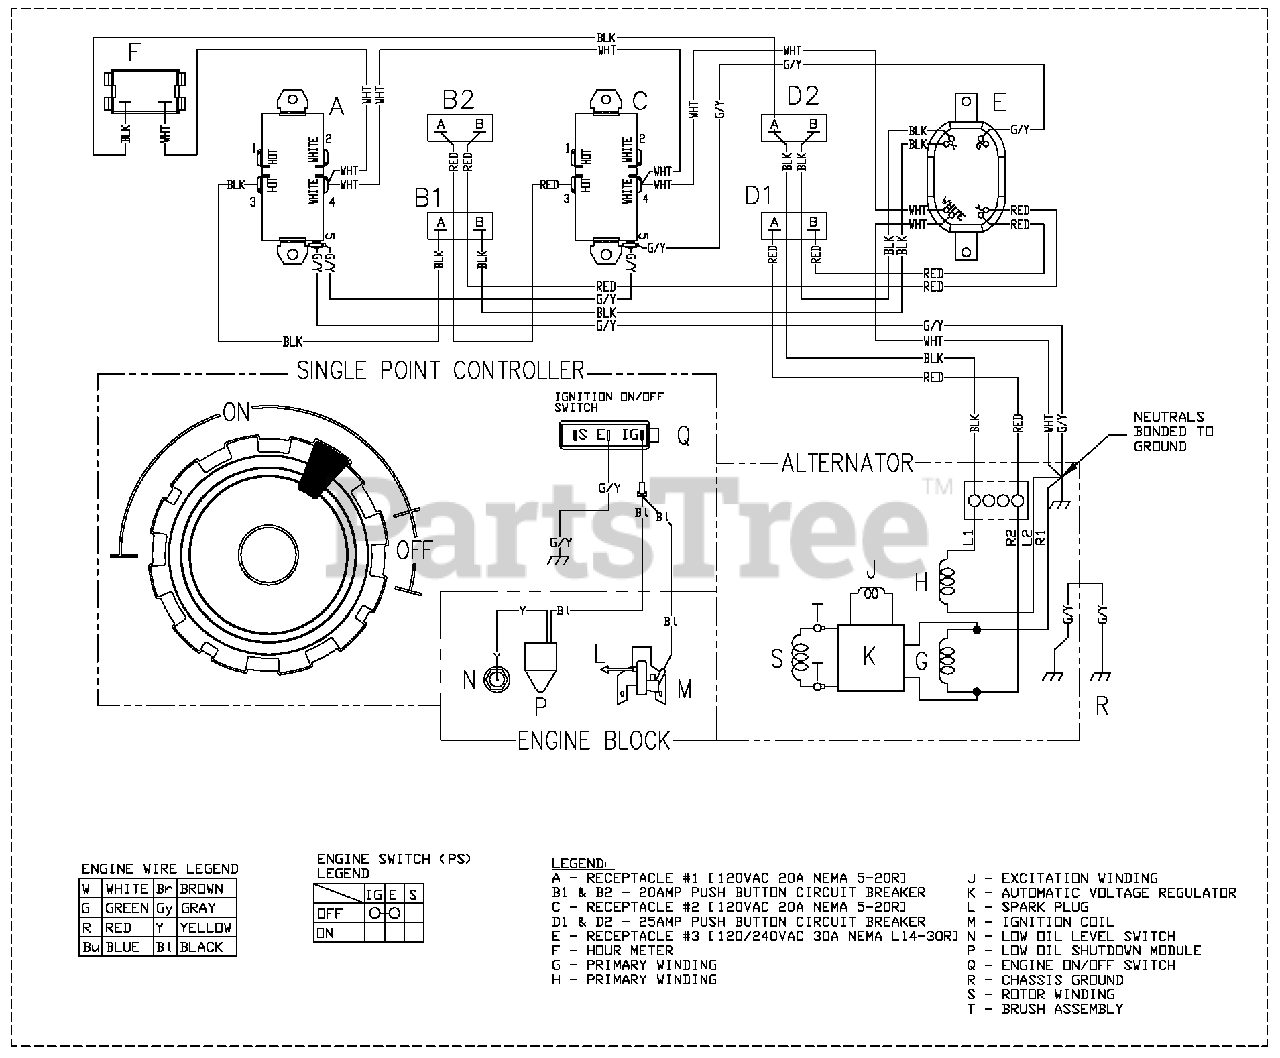 Generac RS5500 (0066720) - Generac Portable Generator (SN: 8802103A -  9786017A) (2015) Wiring Diagram (0K6393) Parts Lookup with Diagrams    PartsTree   Generac Engine Wiring Diagram      PartsTree